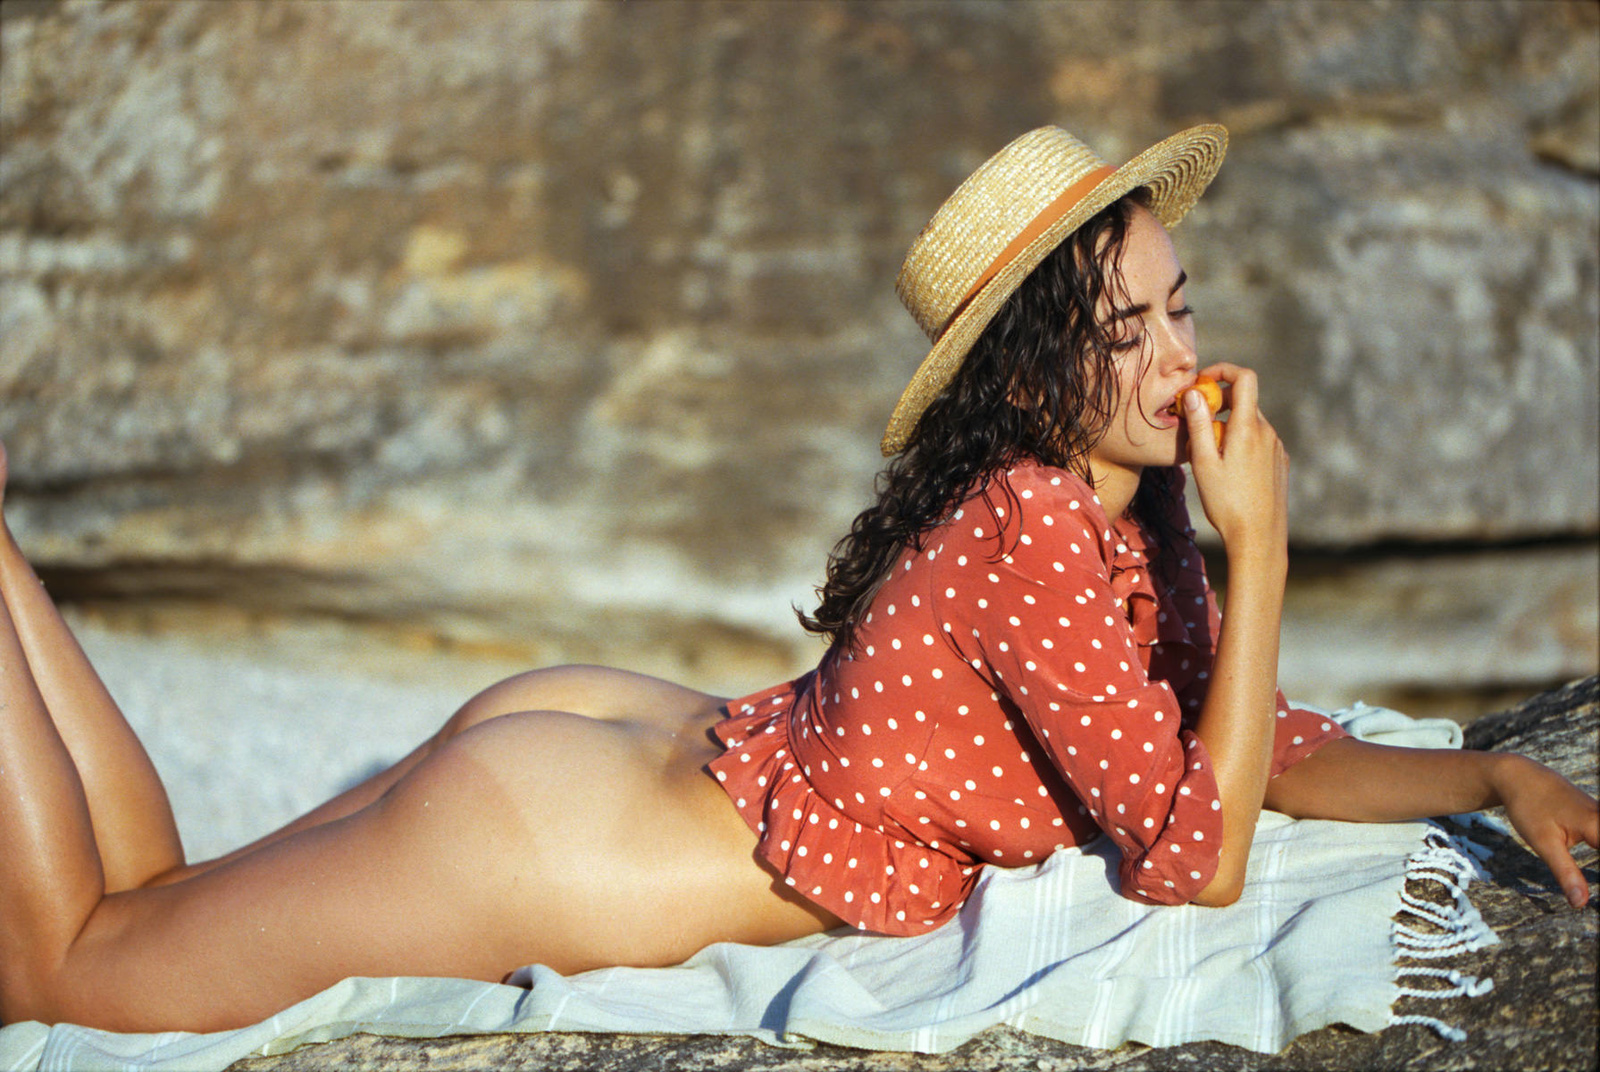 sarah-stephens-seaside-erotic-photo-by-cameron-mackie-05